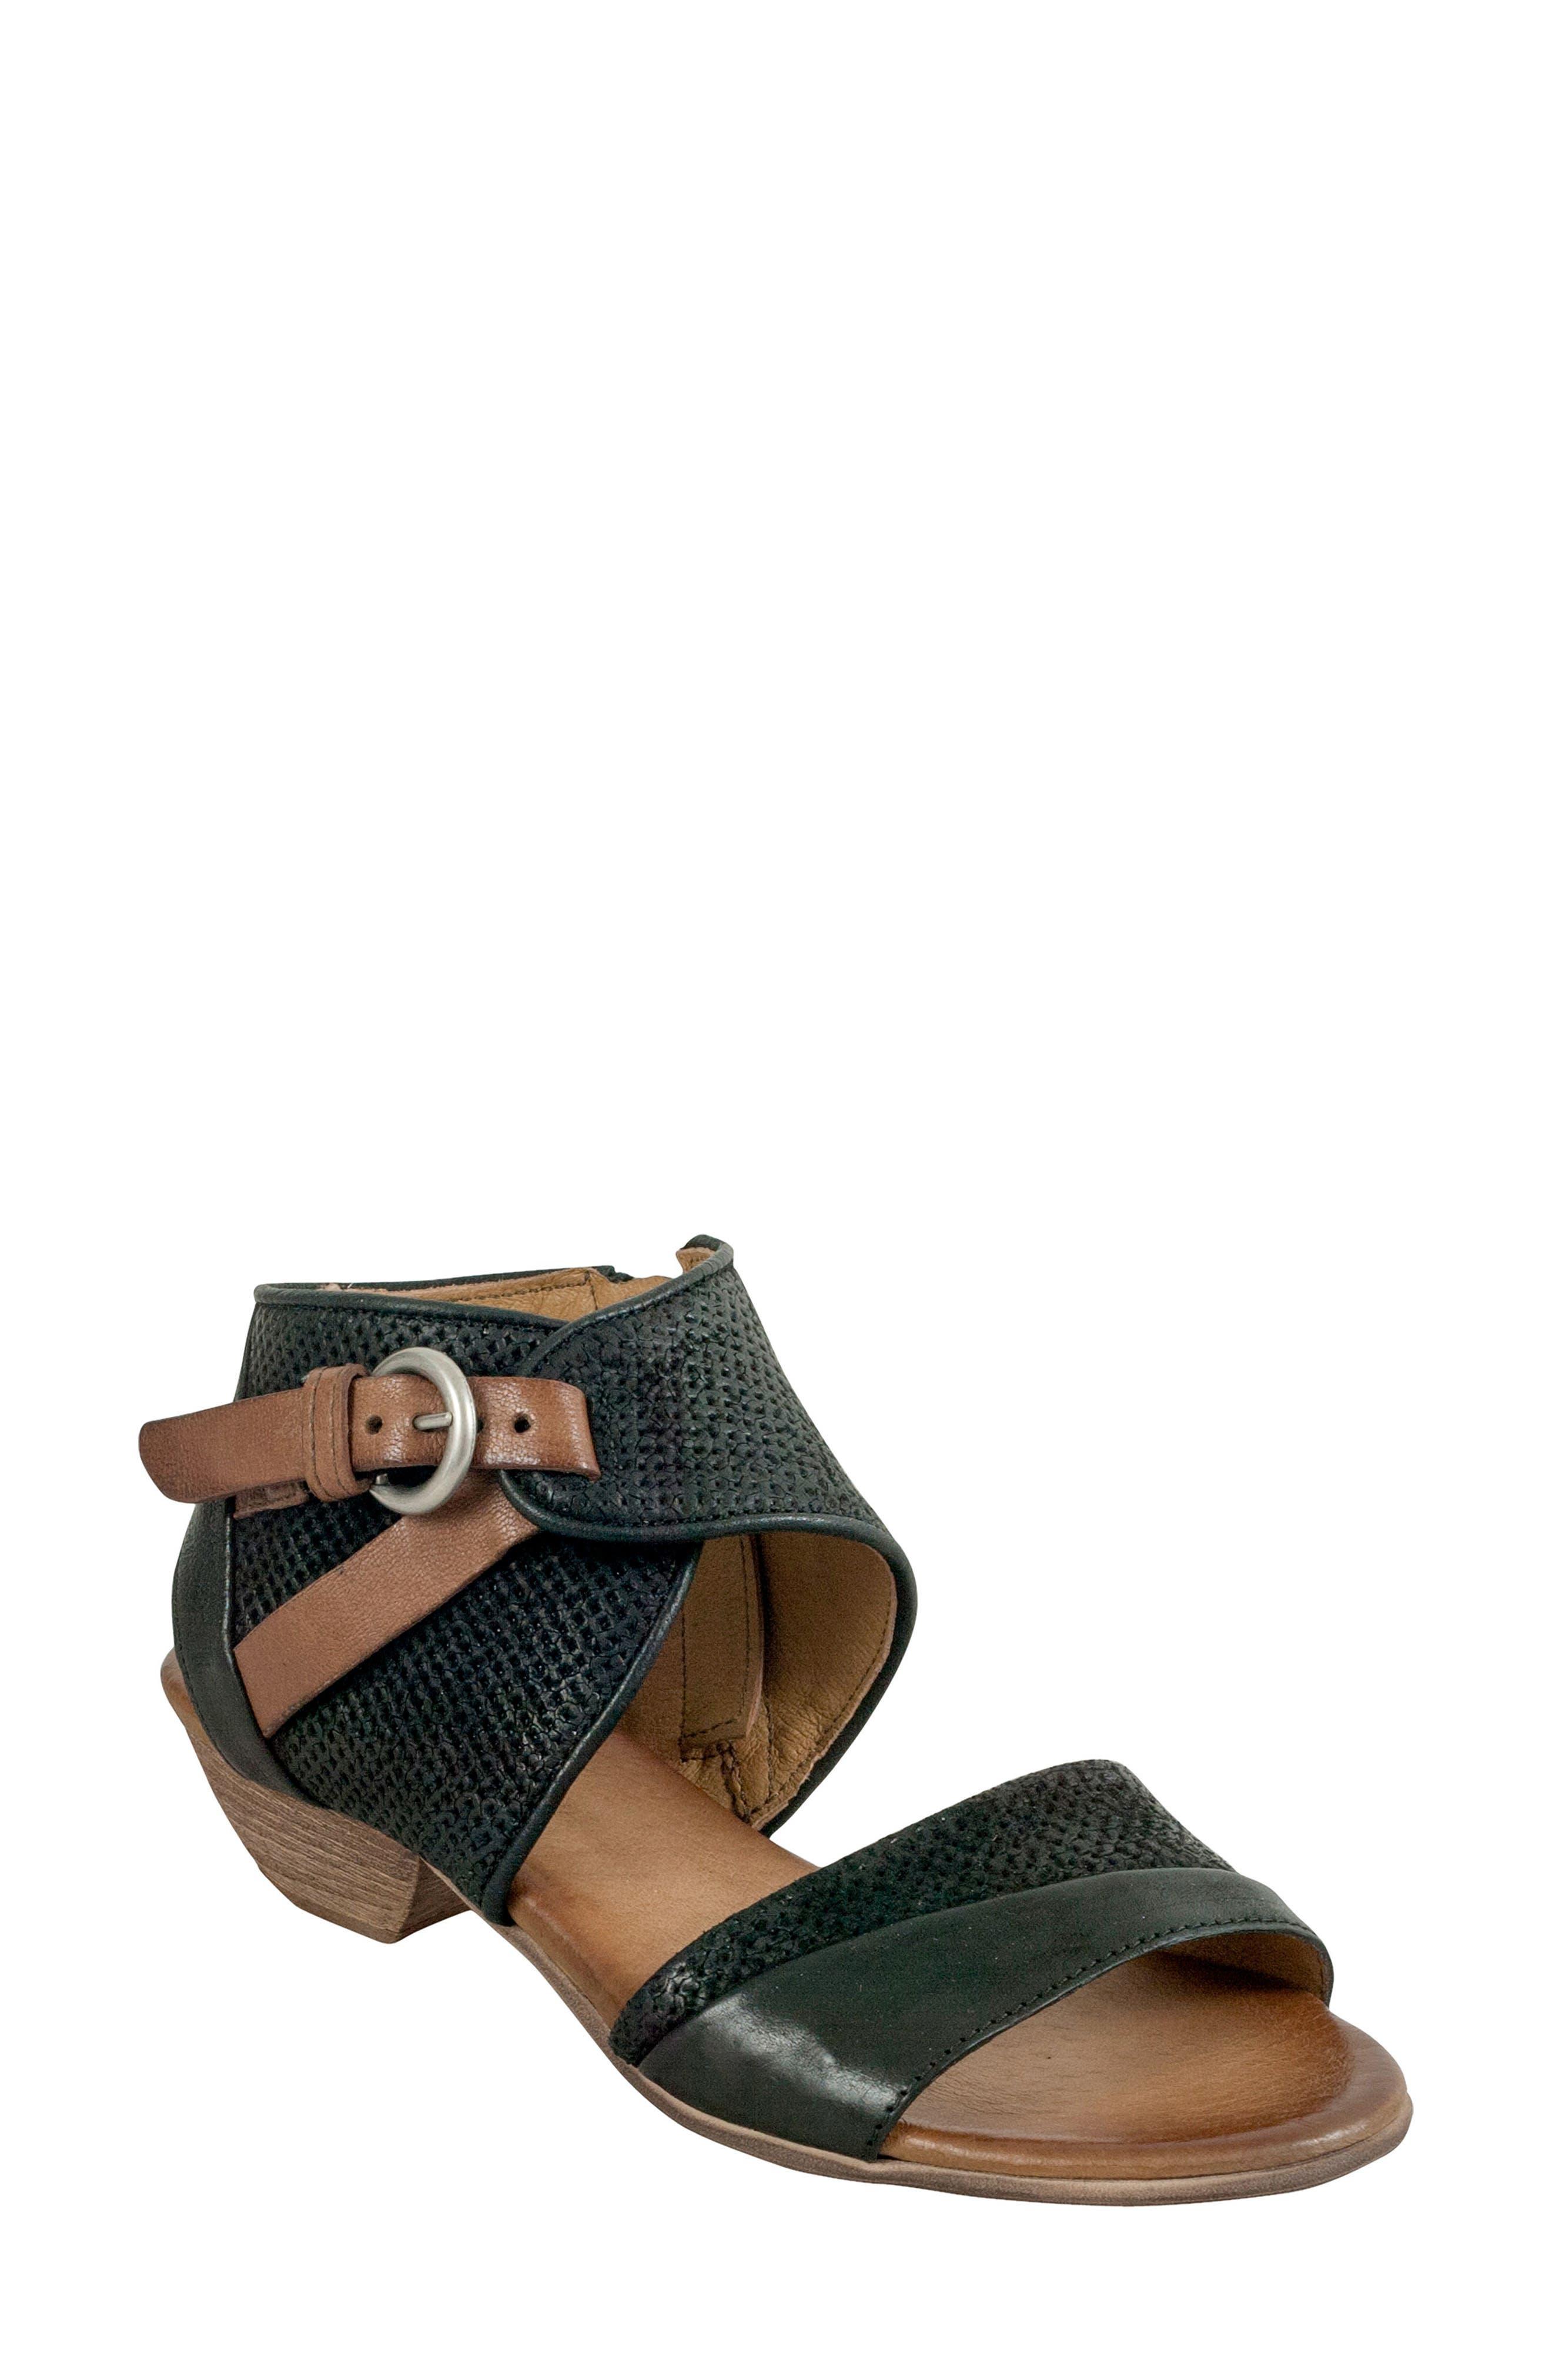 Chatham Textured Sandal,                         Main,                         color, 001